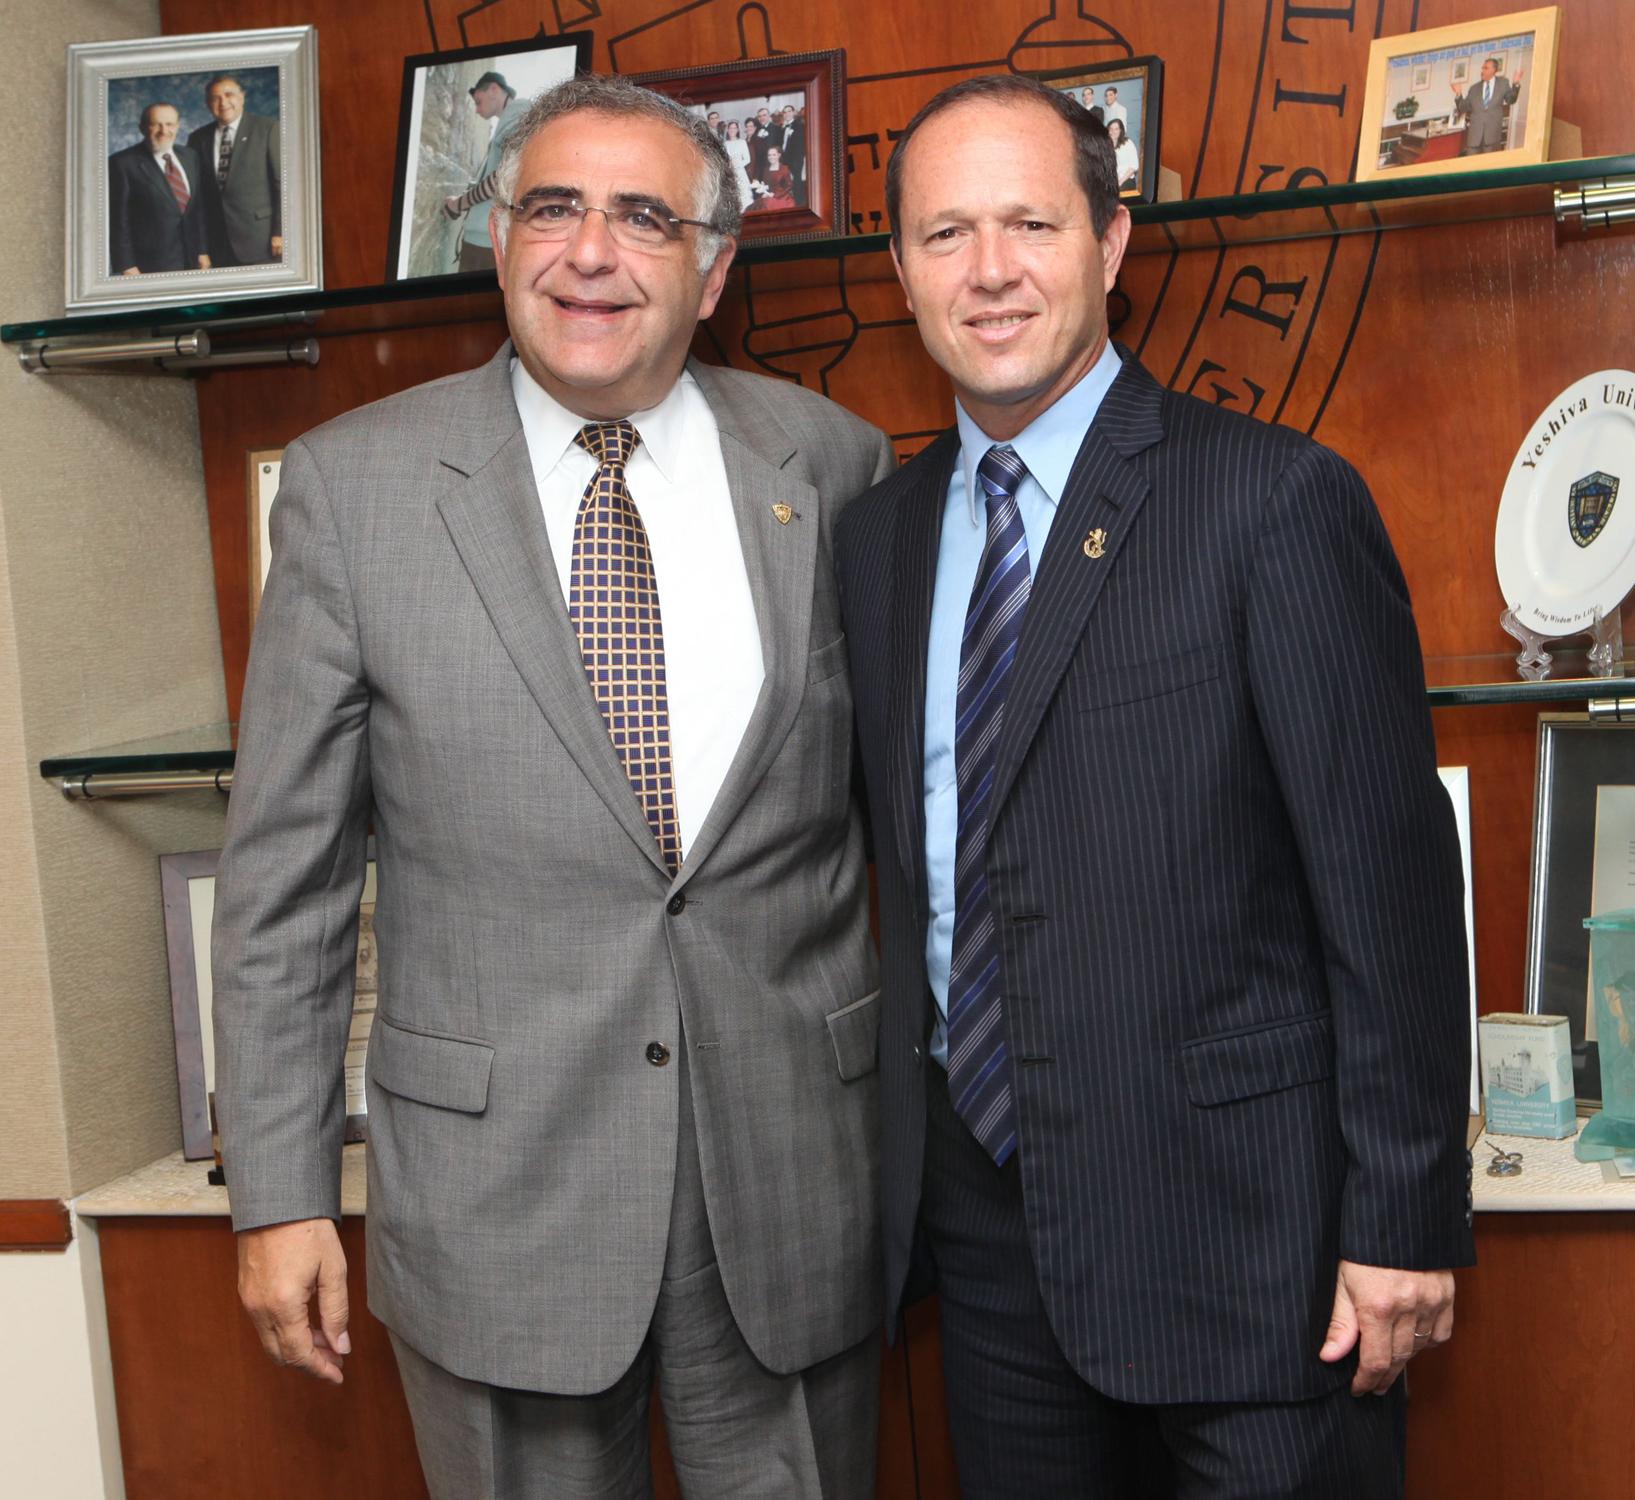 President Richard M. Joel and Jerusalem Mayor Nir Barkat at Yeshiva University